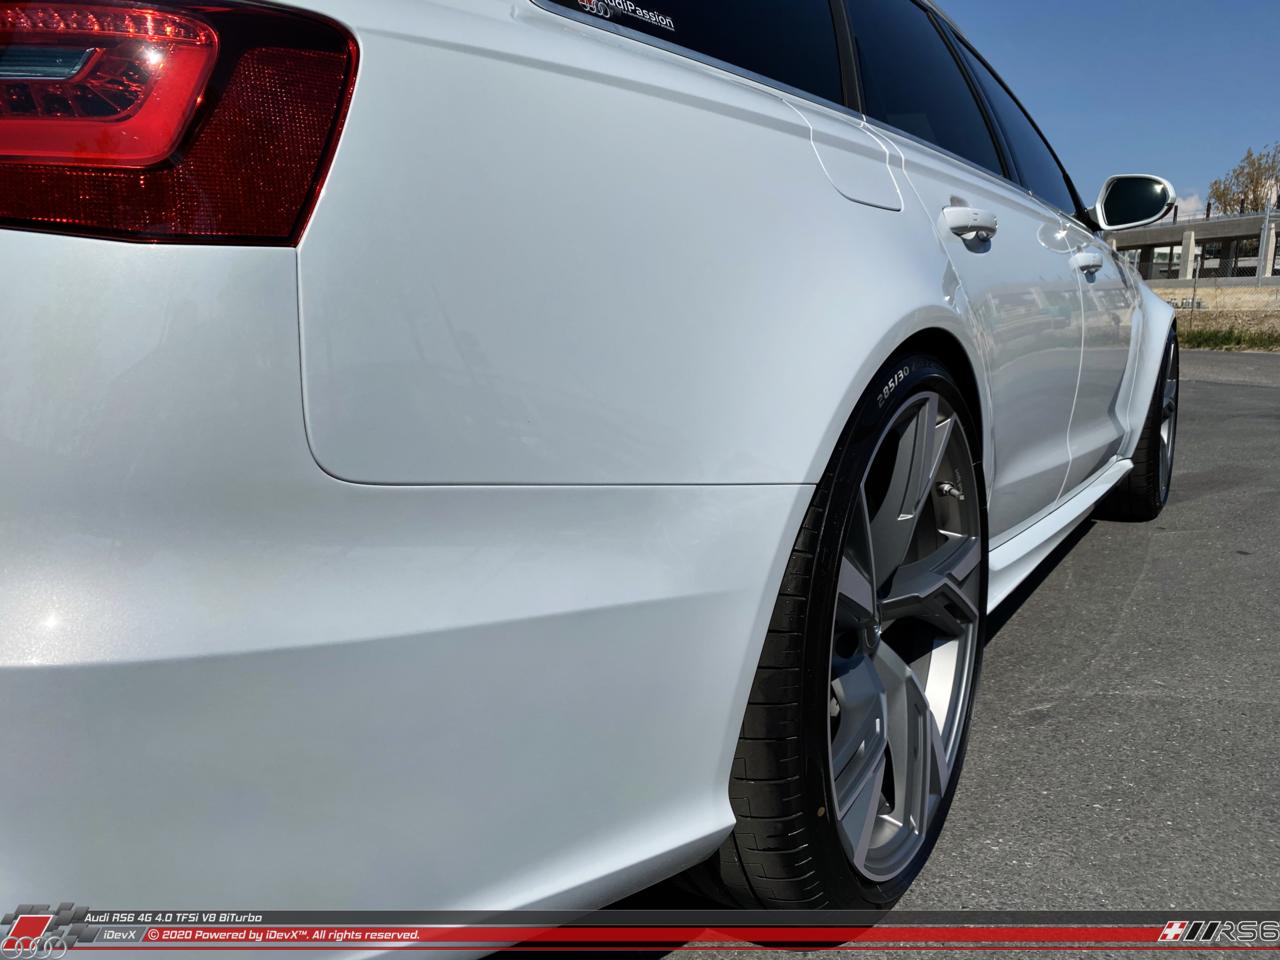 24.04.2020_Audi-RS6_iDevX_014.png